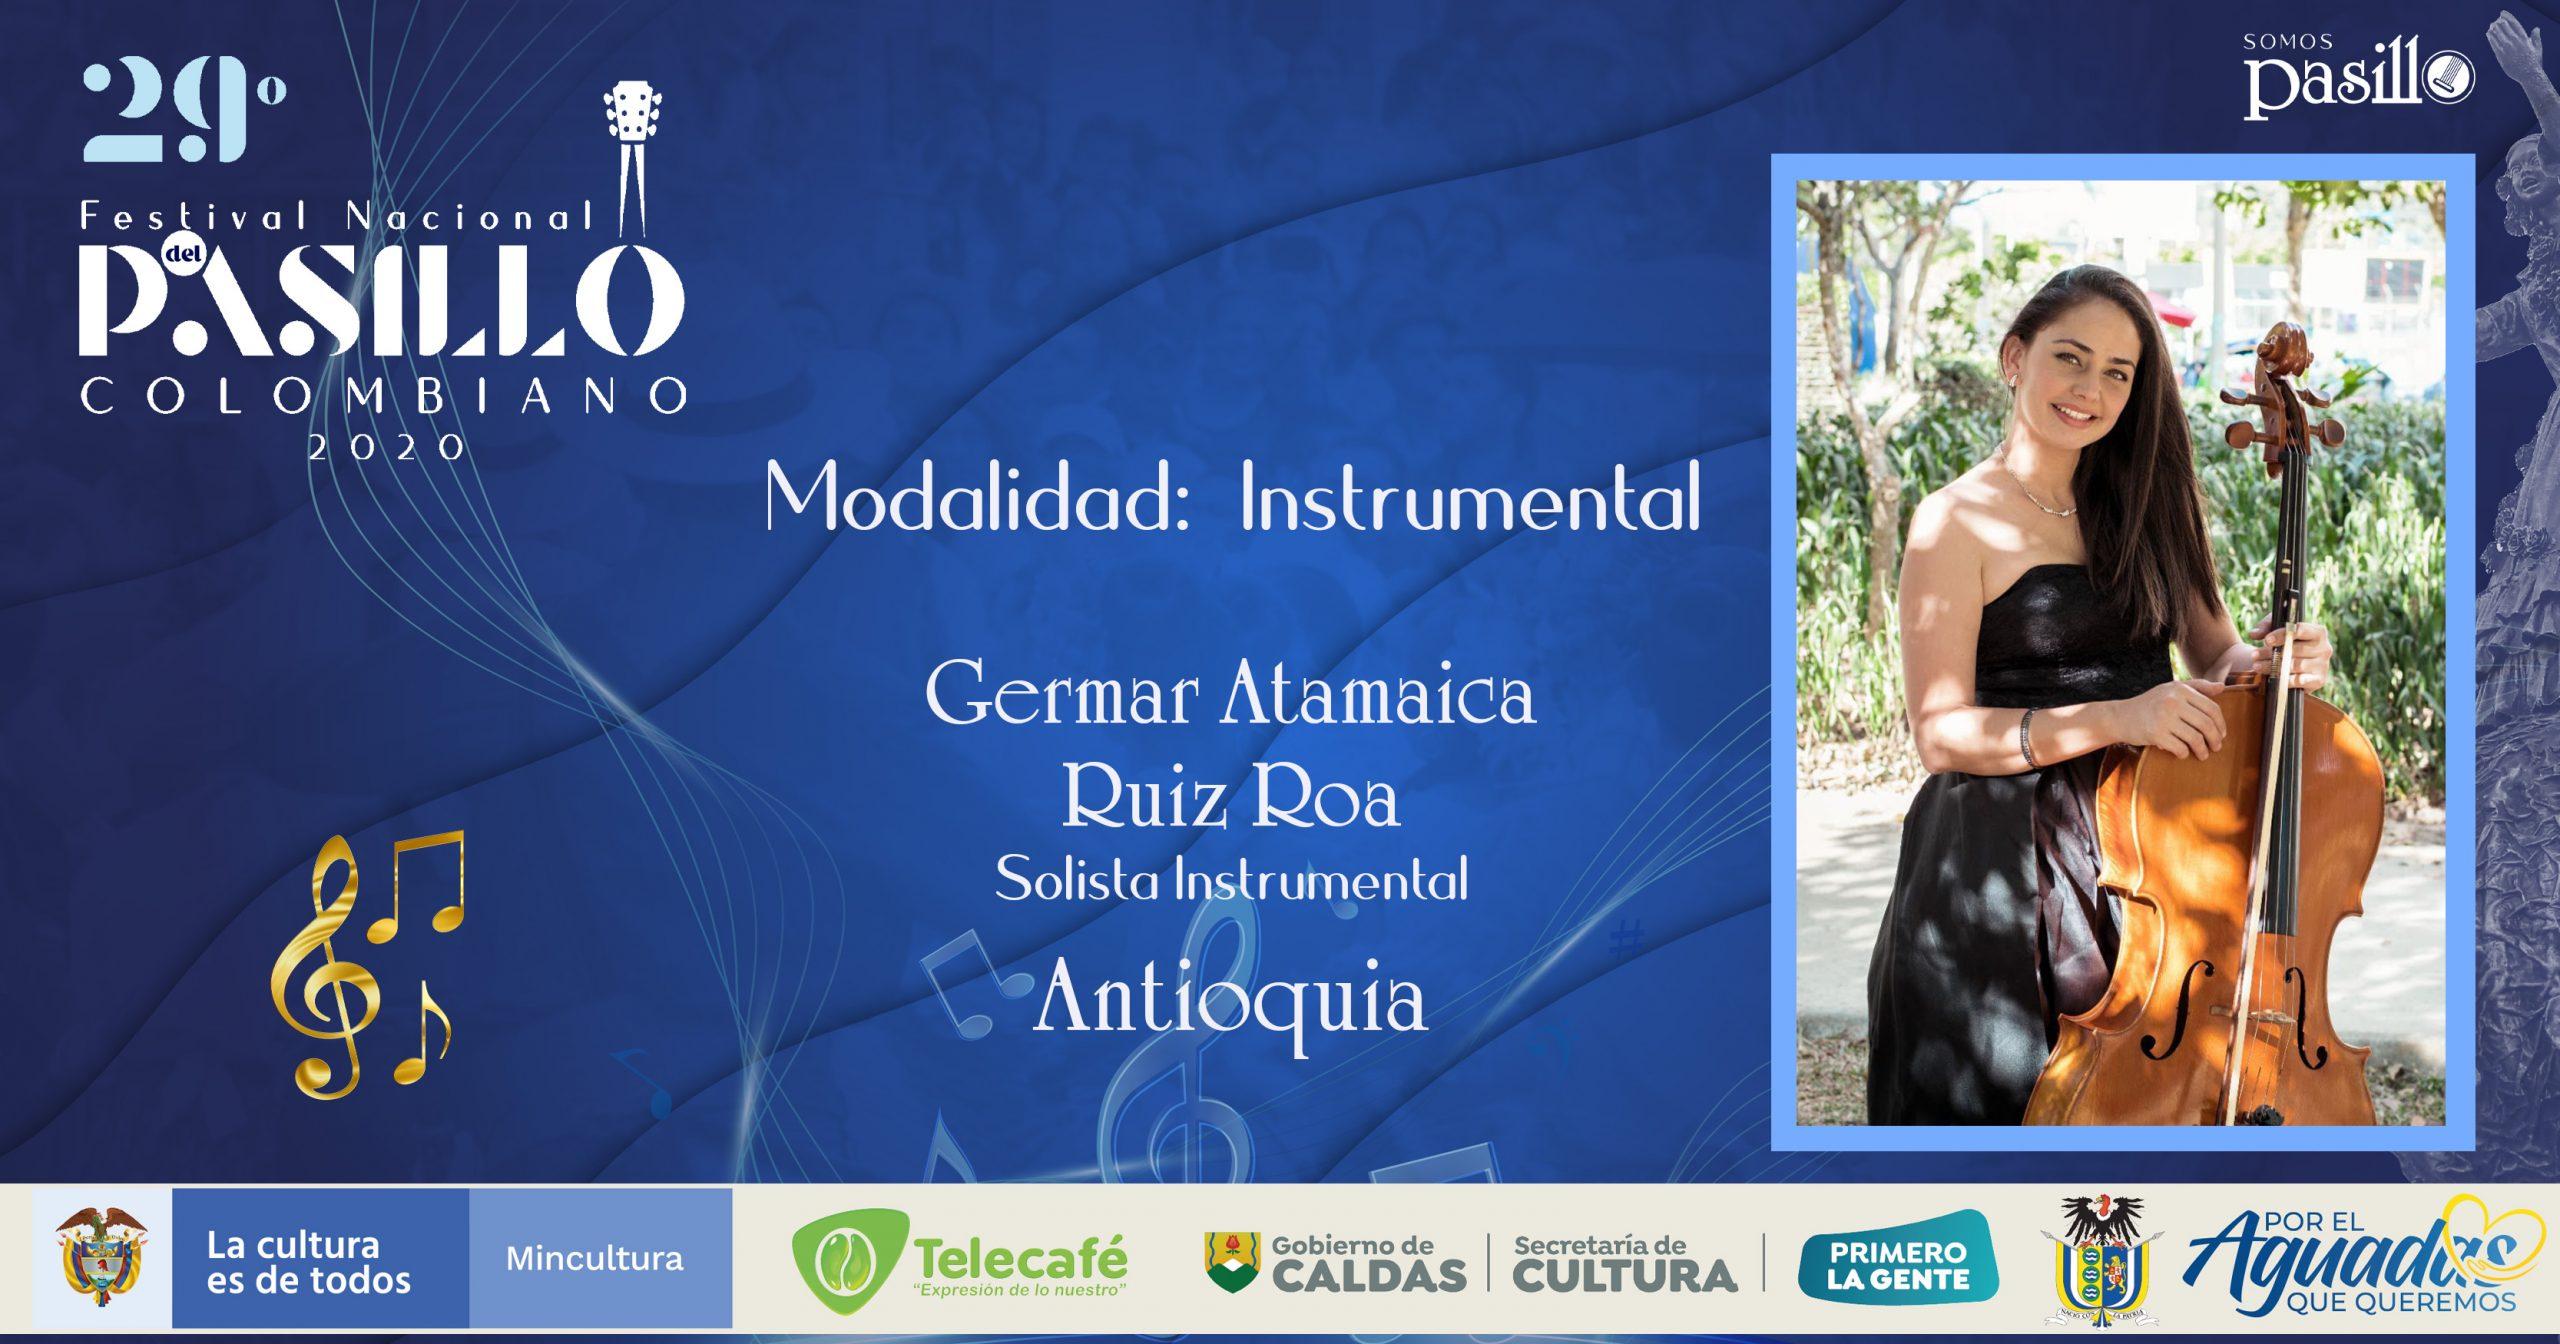 Germar Atamaica Ruiz Roa